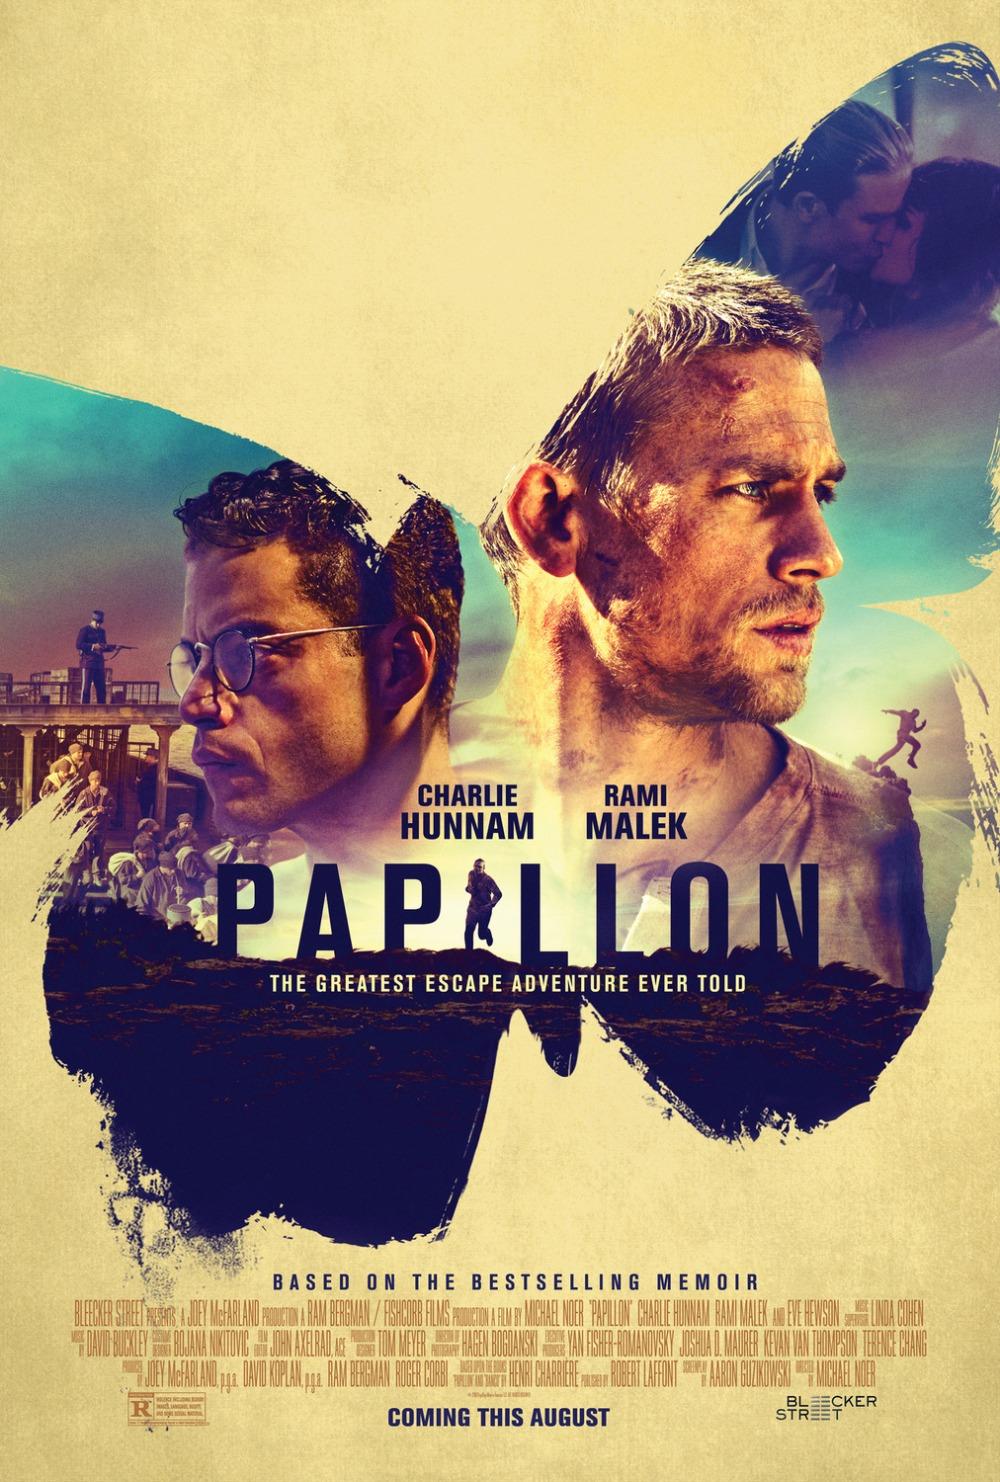 Papillon 2018 movie poster